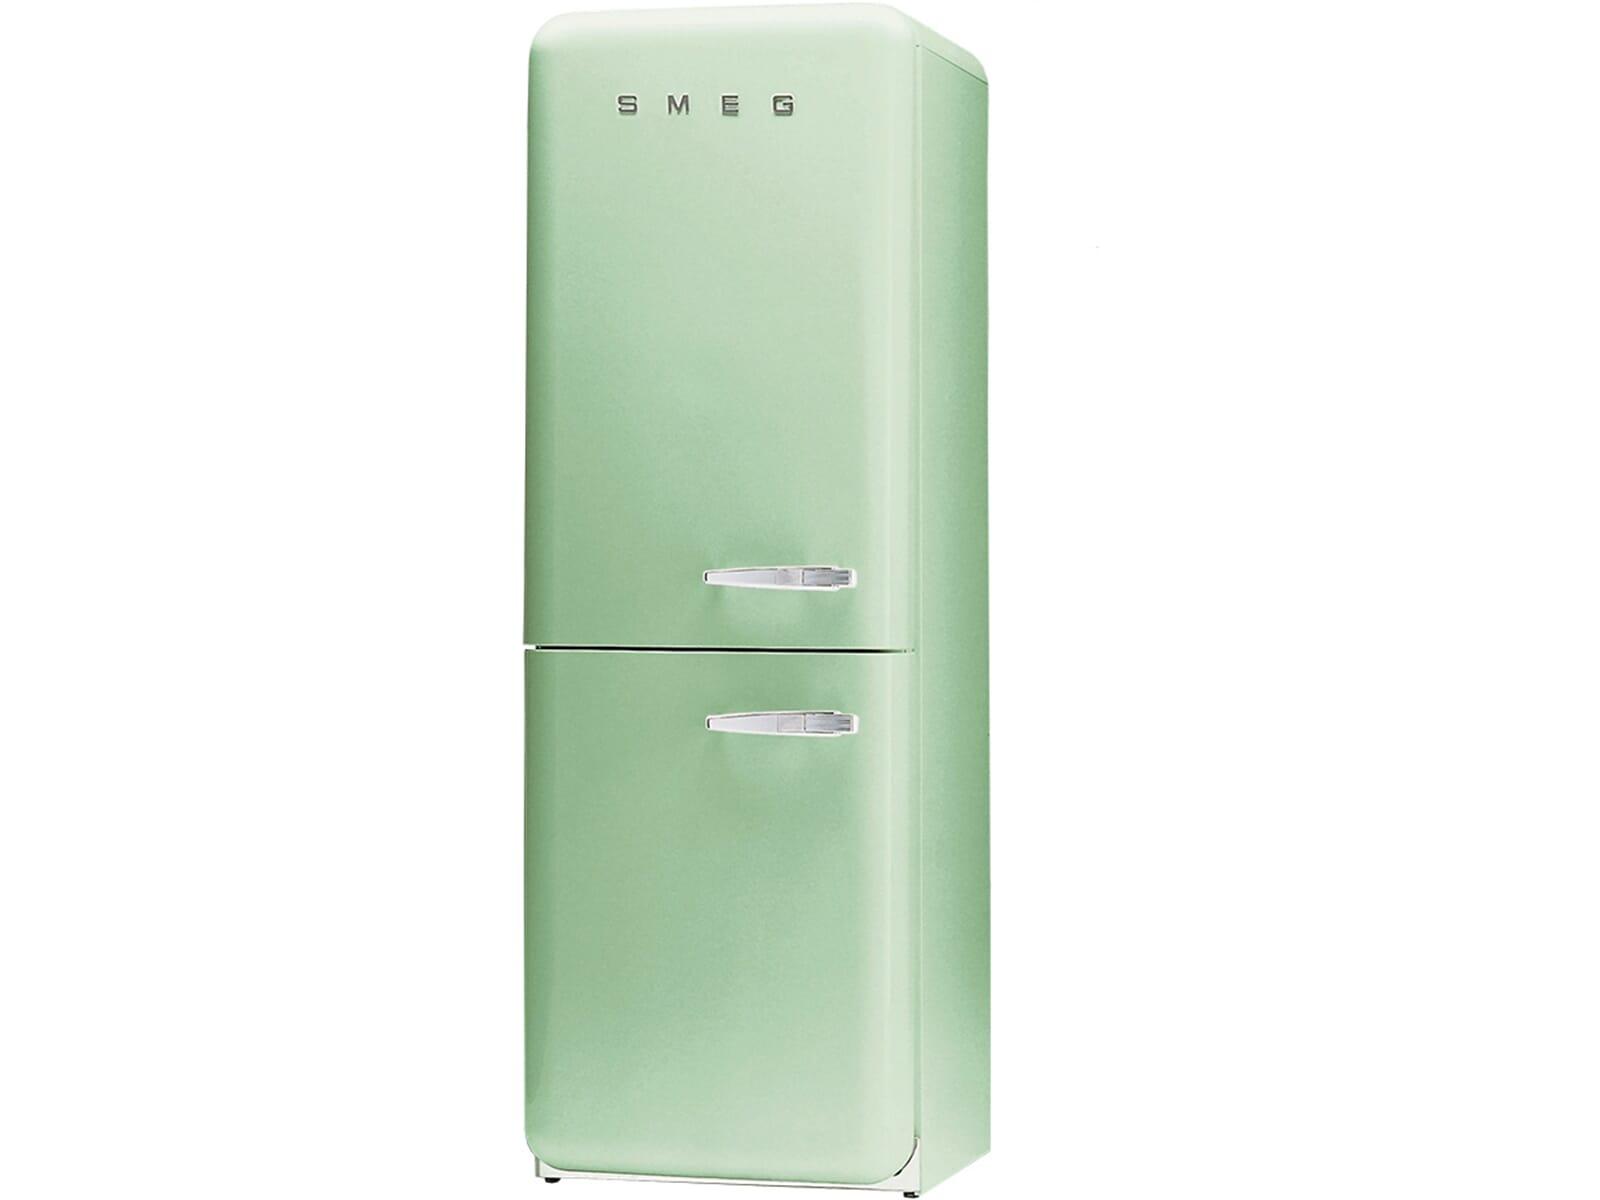 Smeg Kühlschrank Beige : Smeg kuehlschrank fab 10 smeg fab32ve7 stand kühl gefrier